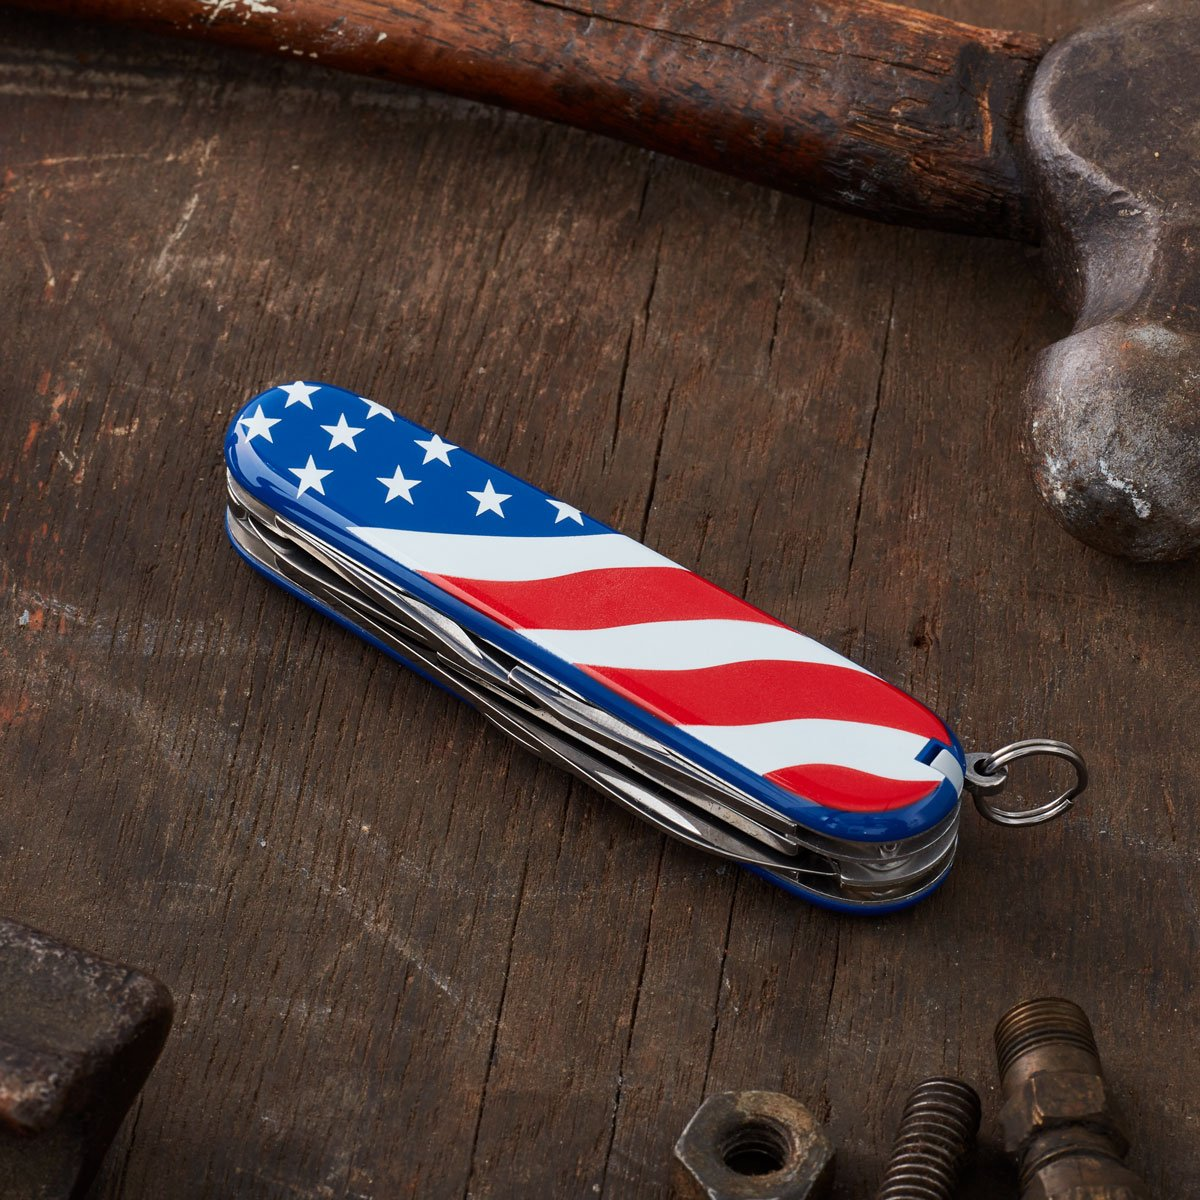 Victorinox Swiss Army Super Tinker Pocket Knife, American Flag,91mm